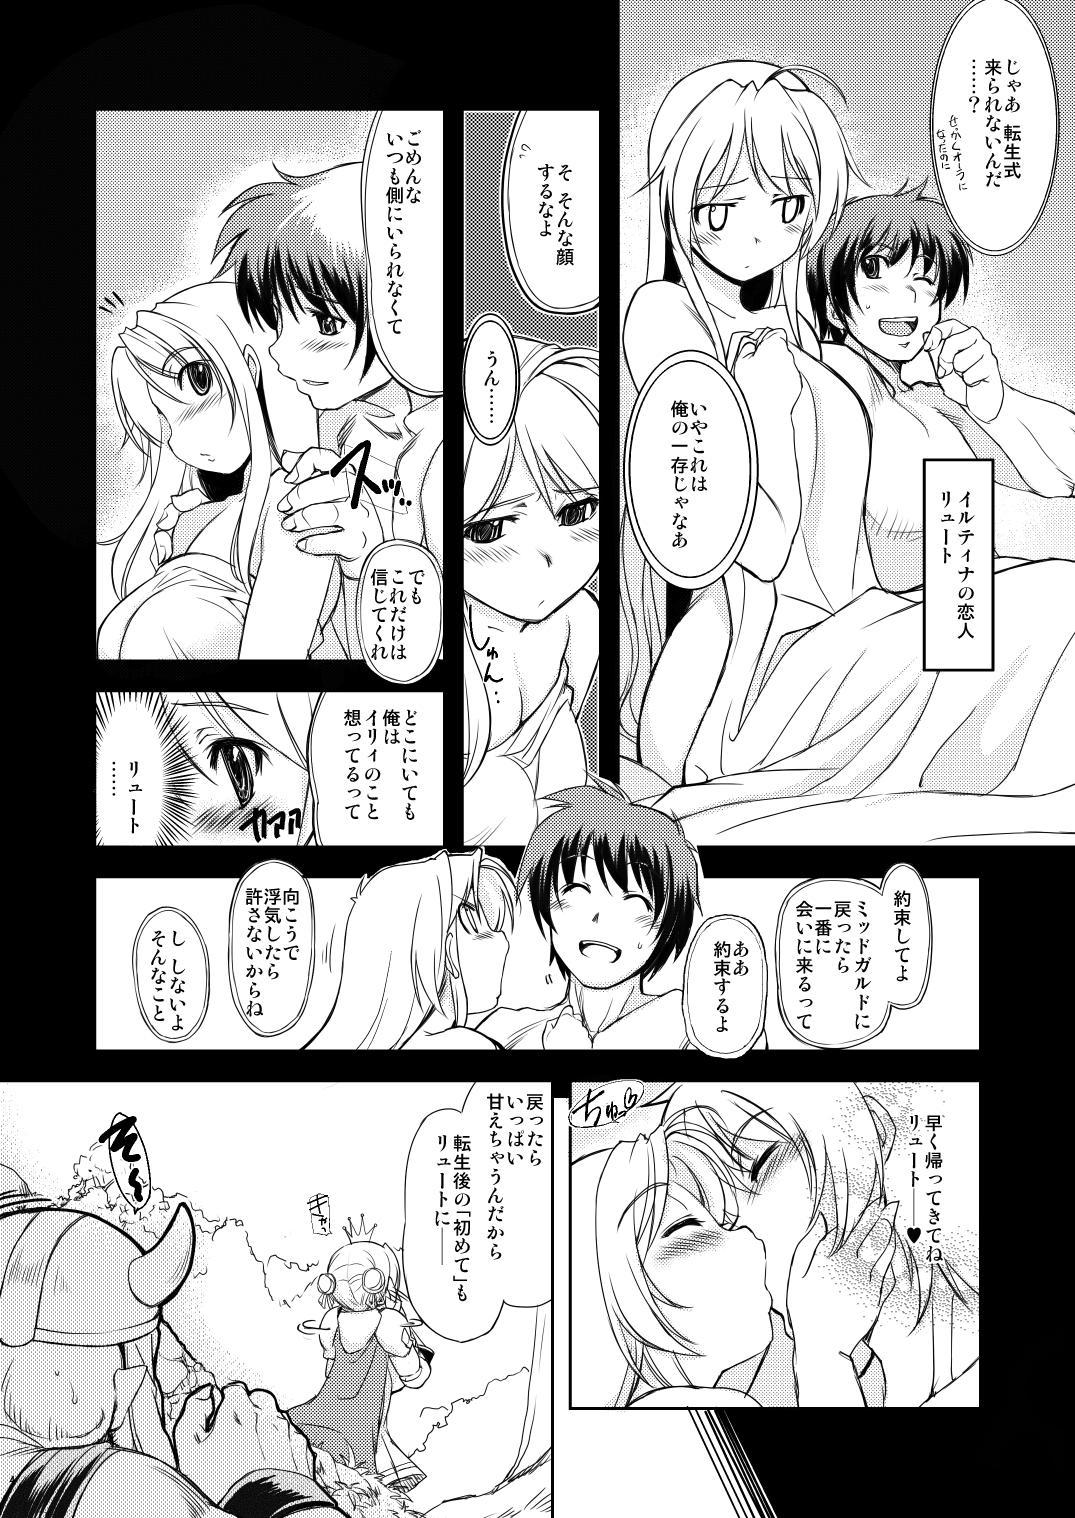 Hime Kishi Tame 1 2